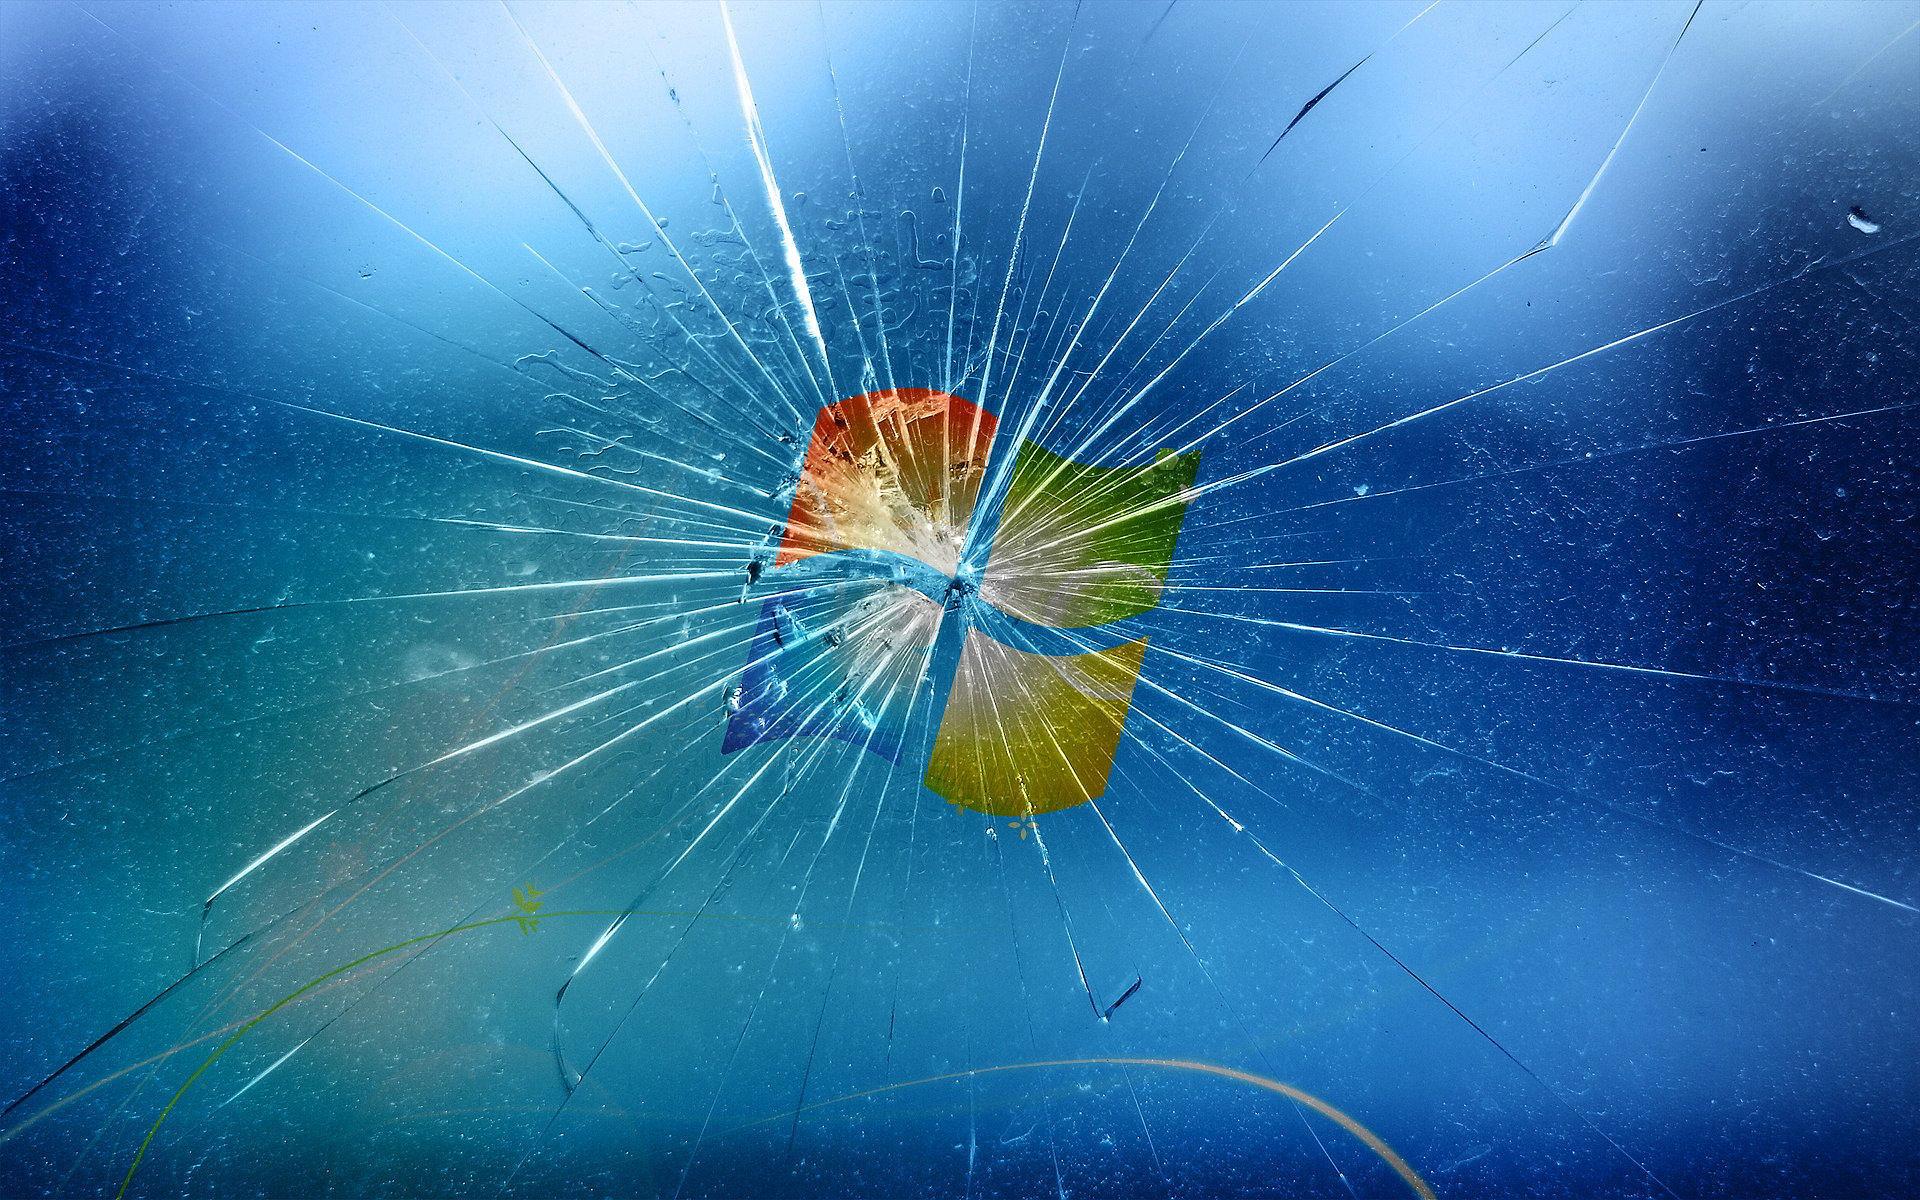 Broken Screen Wallpaper Windows 8 hd wallpaper background desktop 1920x1200